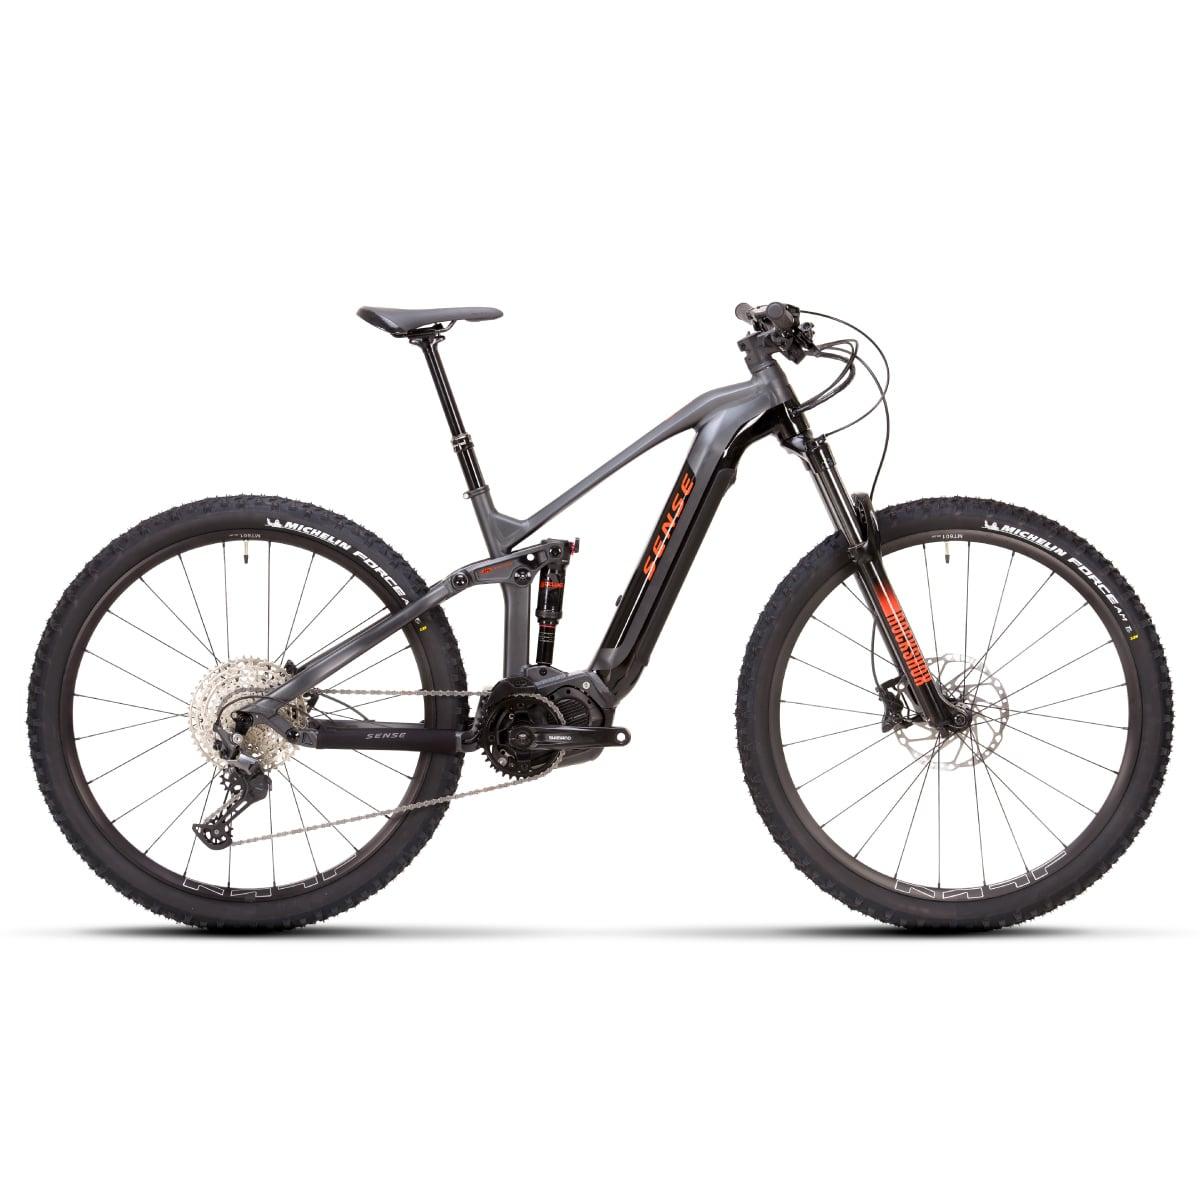 Bike Sense Eletrica Impulse E-Trail Comp 2021 Shimano Deore 12v Cinza e Laranja